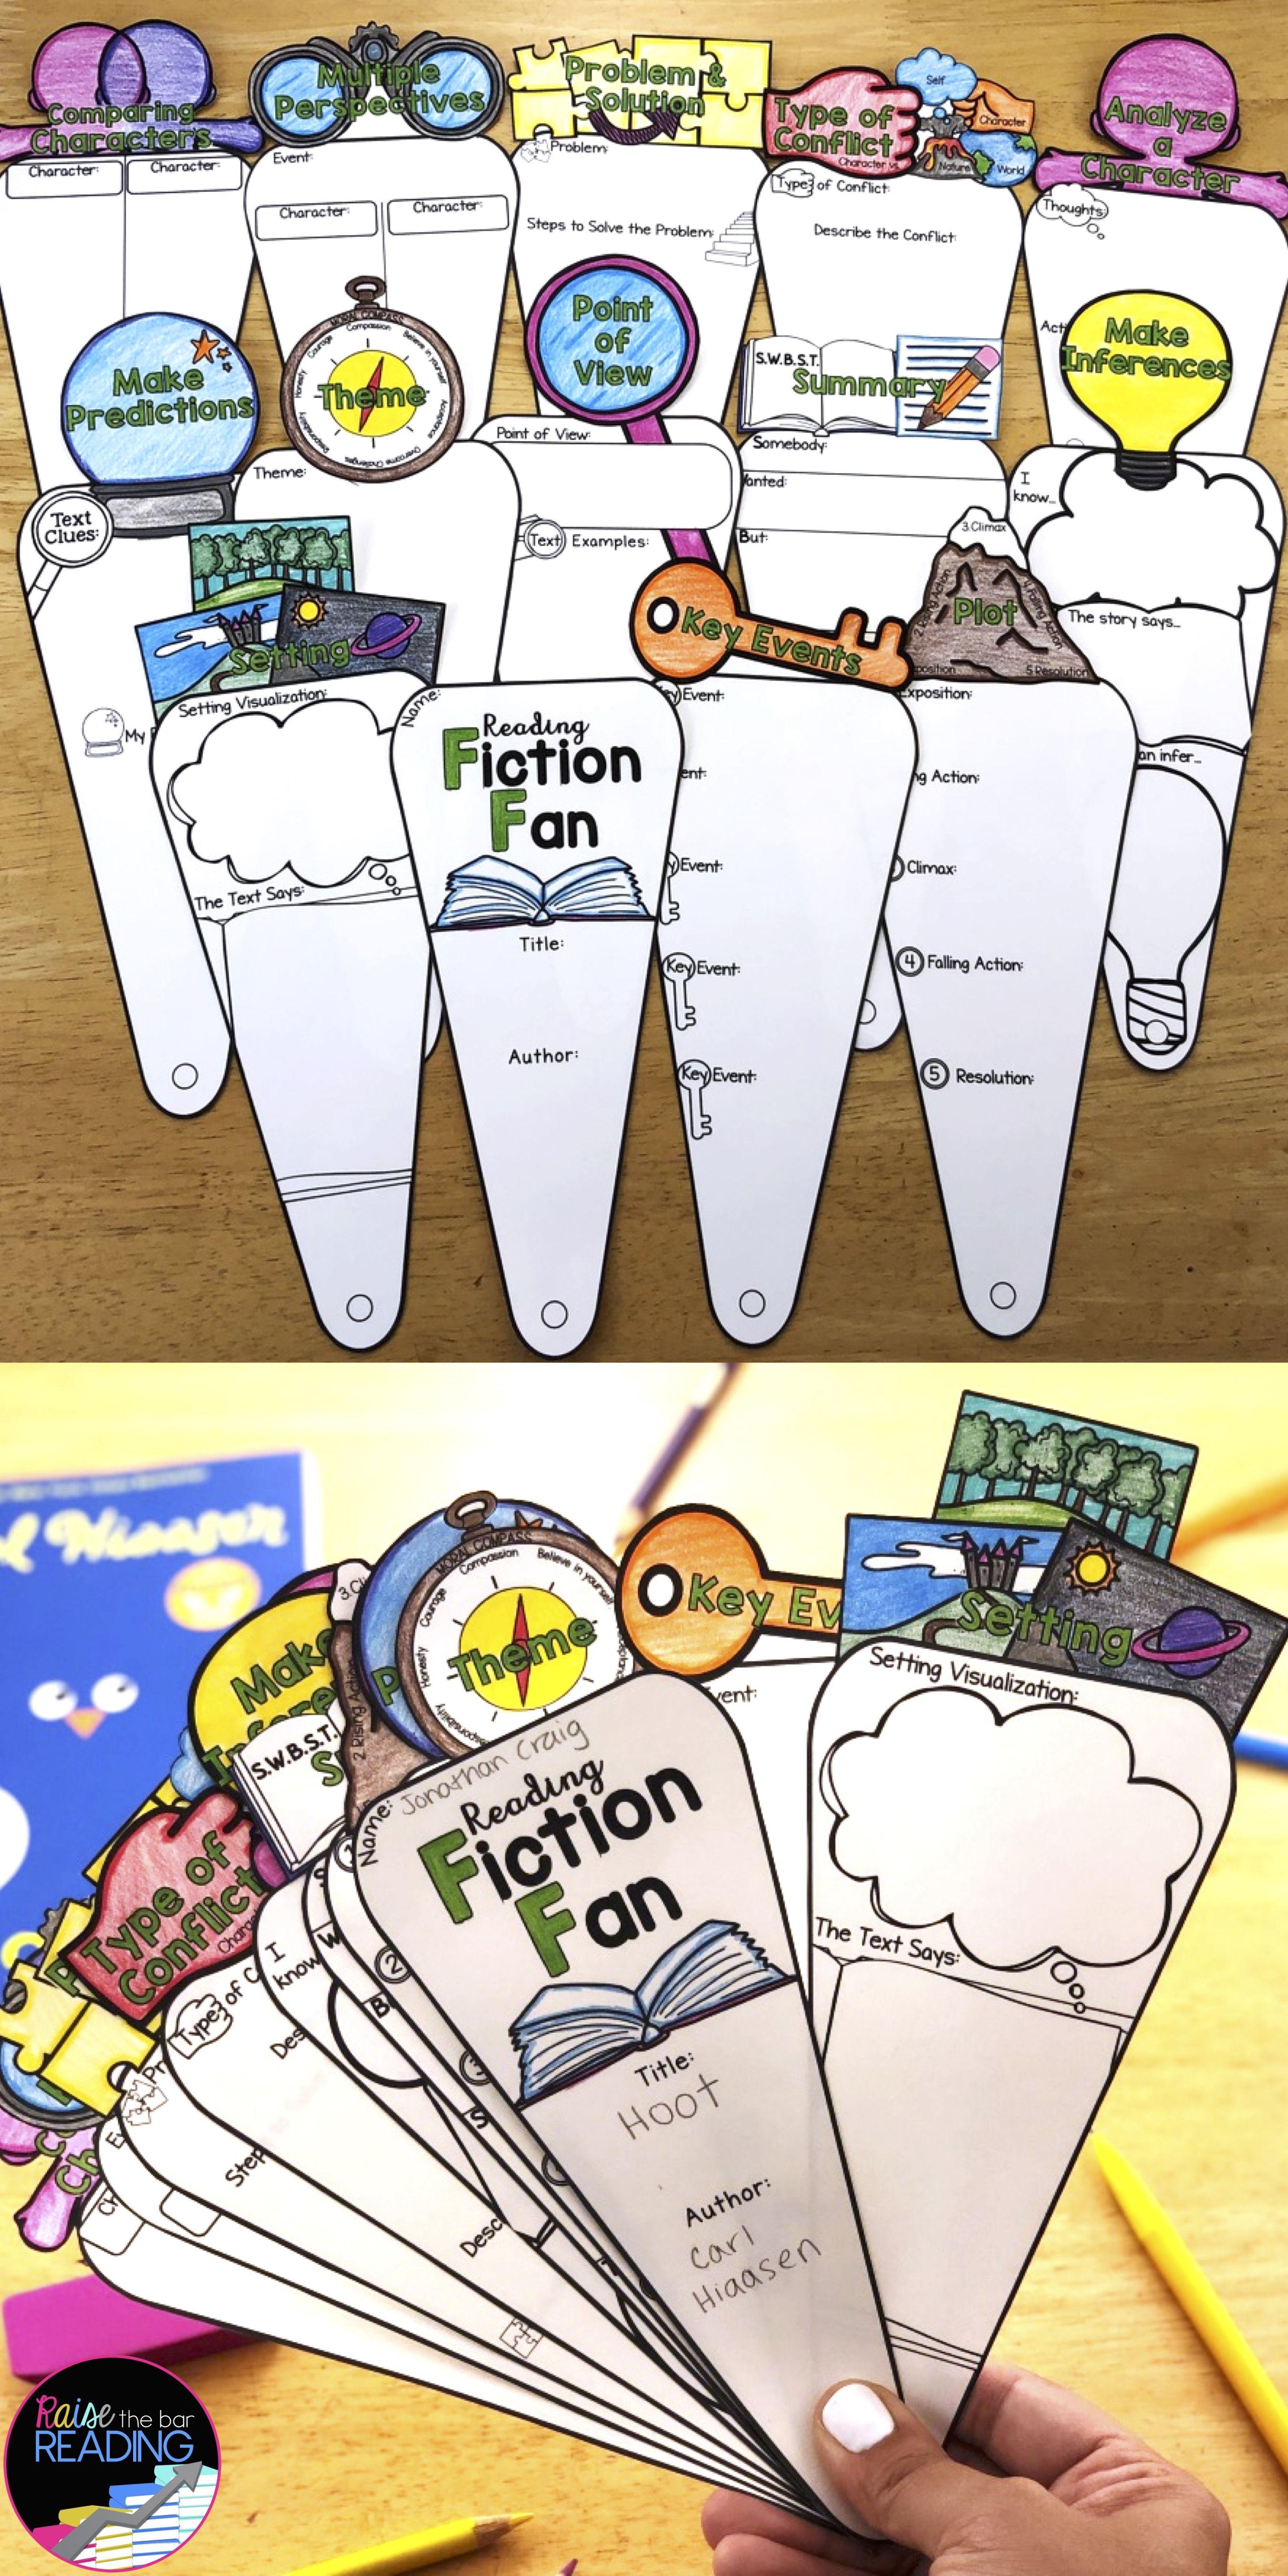 Fiction Reading Fan Fiction Reading Response Fiction